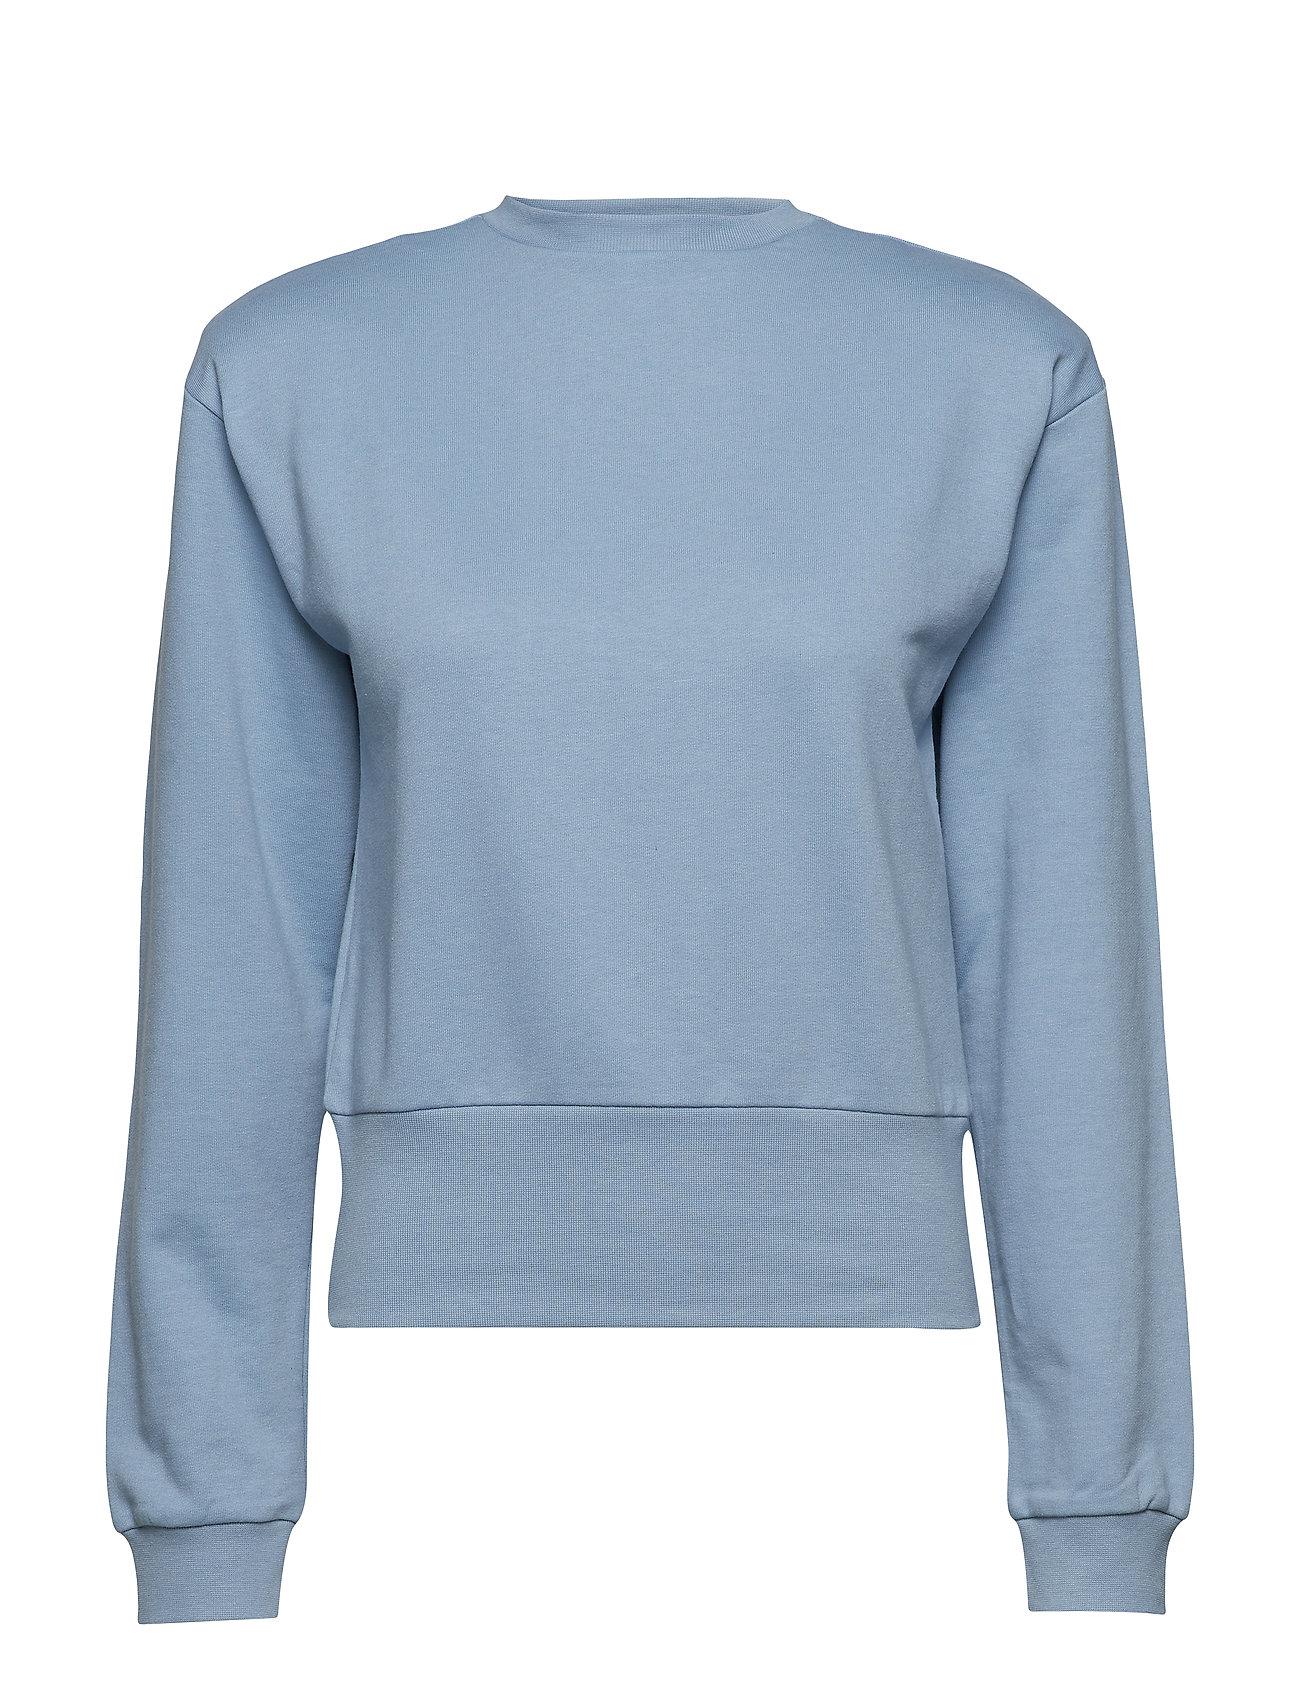 Sweaterlight Jersey BlueIvyrevel Sweaterlight Jersey Jersey BlueIvyrevel 5jq4ARLc3